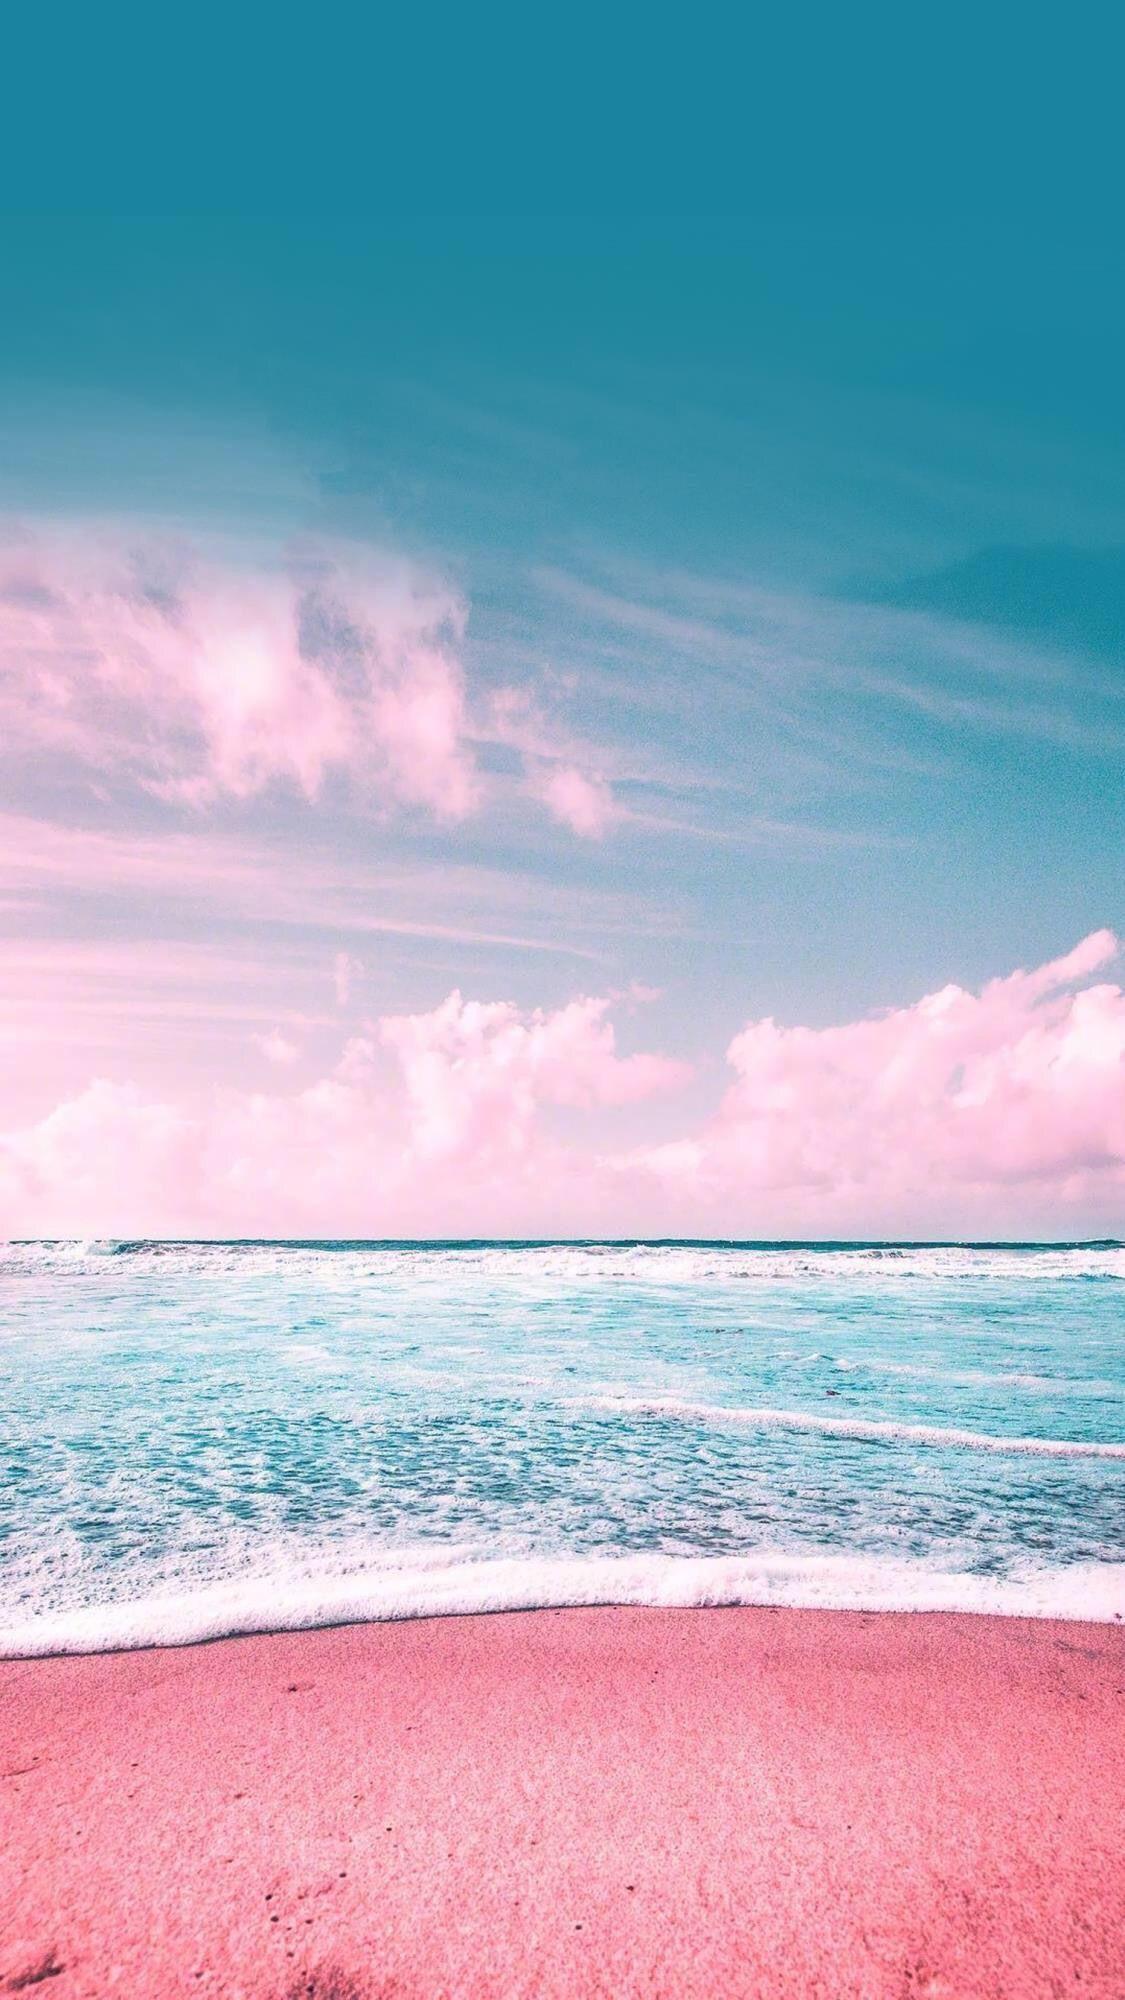 Ruzova Plaz Tapety Iphone Pink Beach Wallpaper Iphone Sveas6368 Pozadi Pink Plaz Tapety Ipho Beach Wallpaper Iphone Beach Wallpaper Wallpaper Iphone Summer